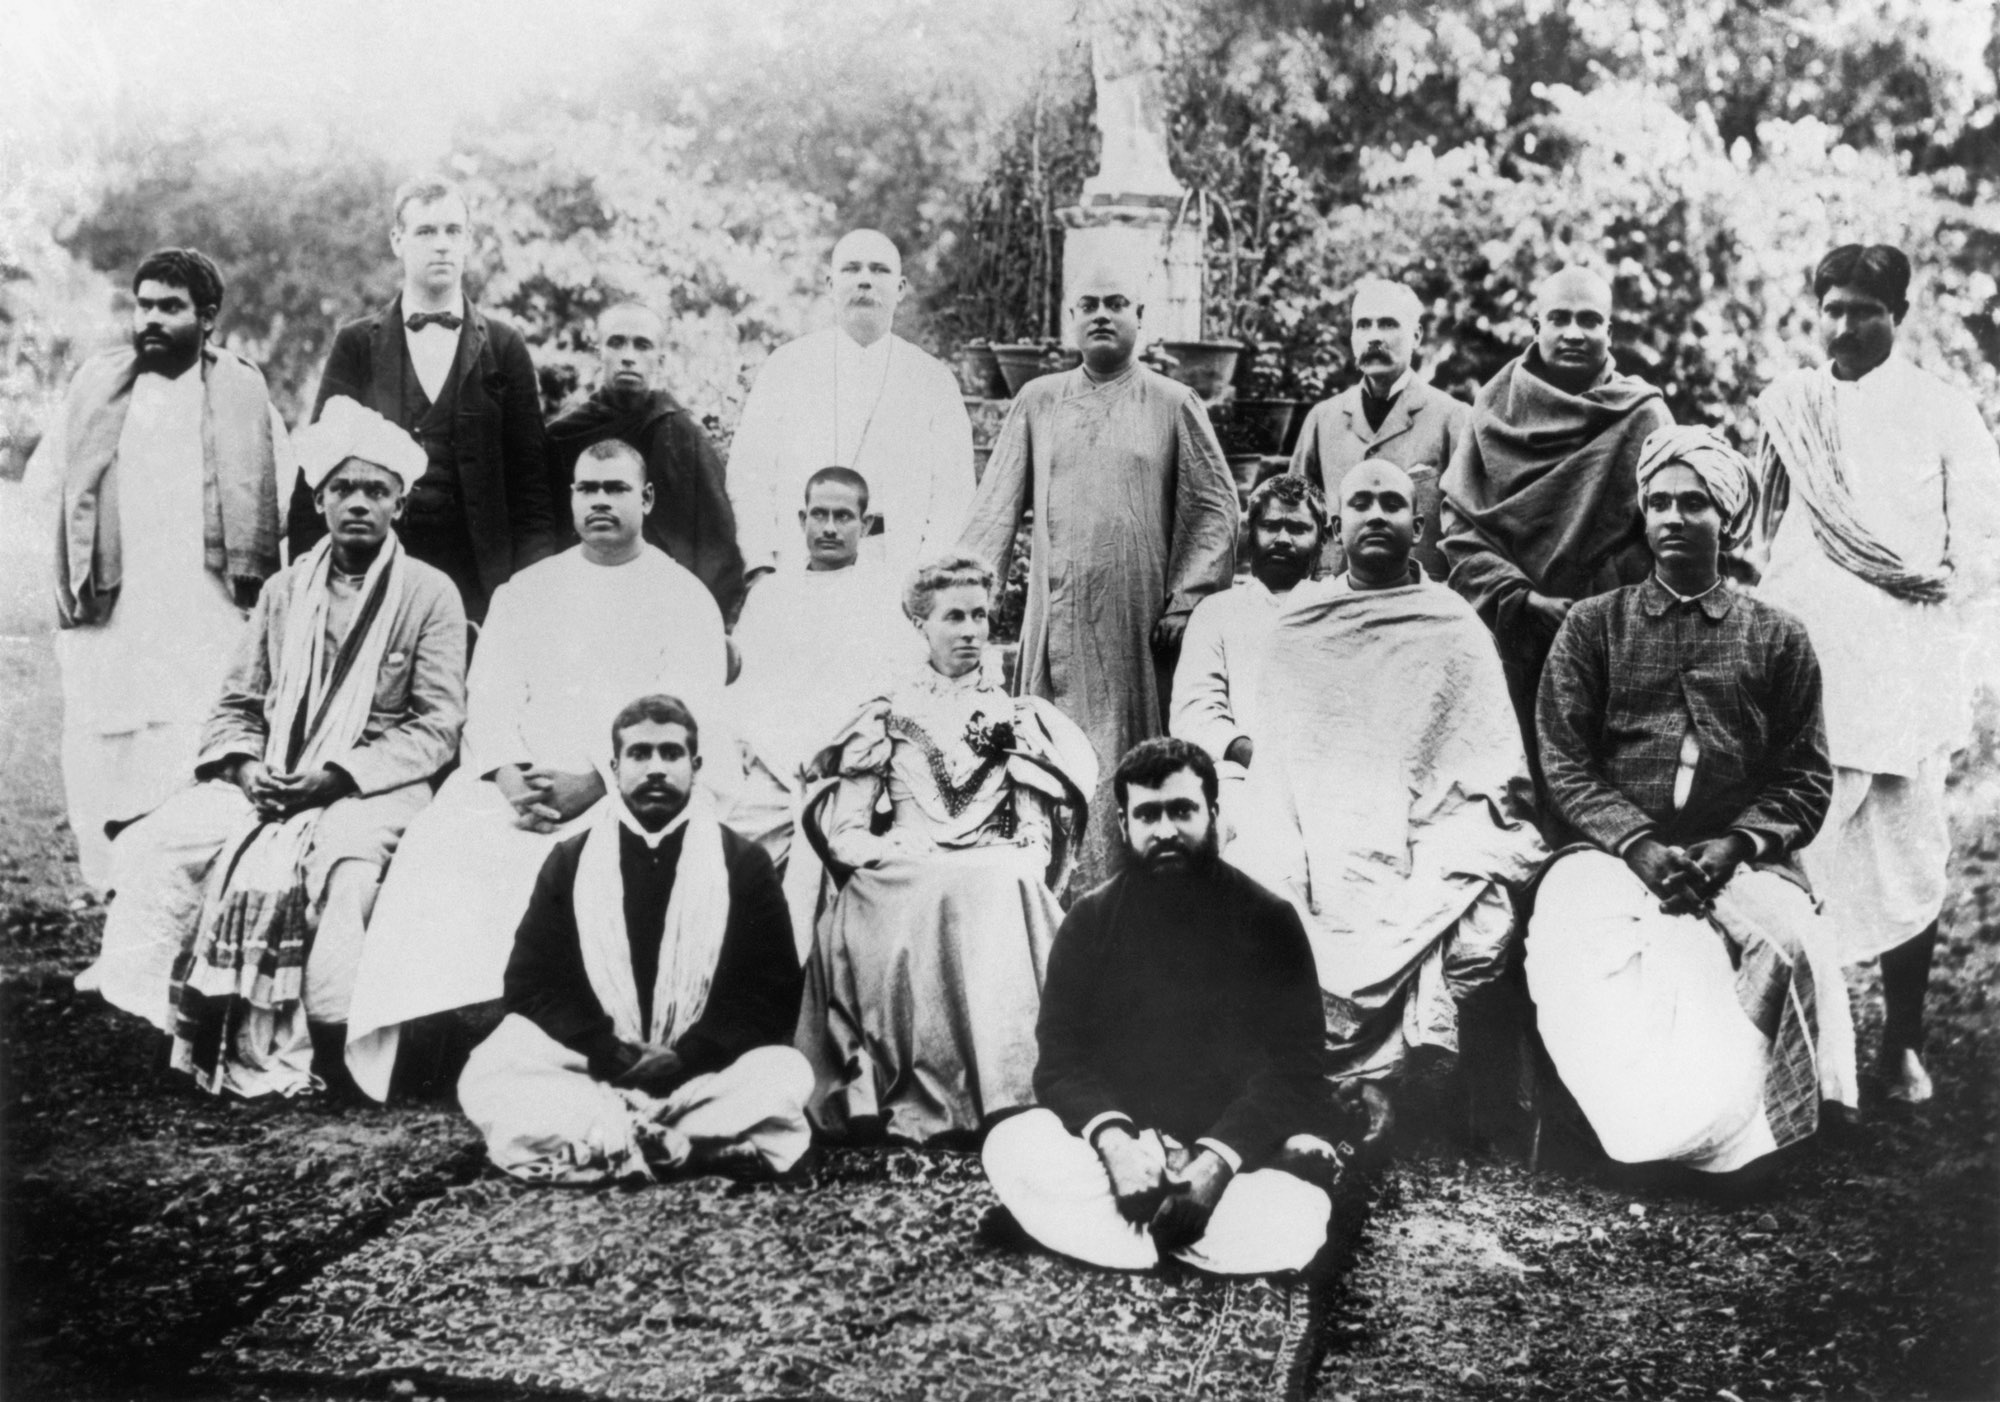 (#65) Kolkata, February 1897.  Standing  ( from  L): Shantiram Babu, Mr. Turnbull, Swami Prakashananda, [unidentified], Swamiji, Capt. Sevier, Swami Shivananda, [unidenfitied].  Sitting  ( from  L): Alasinga Perumal, Swami Ramakrishnananda, Swami Premananda, Mrs. Sevier, Swami Adbhutananda, Swami Turiyananda, G. G. Narasimhachariar.  Floor  ( from  L): [unidentified], Mr. Harrison from Colombo.